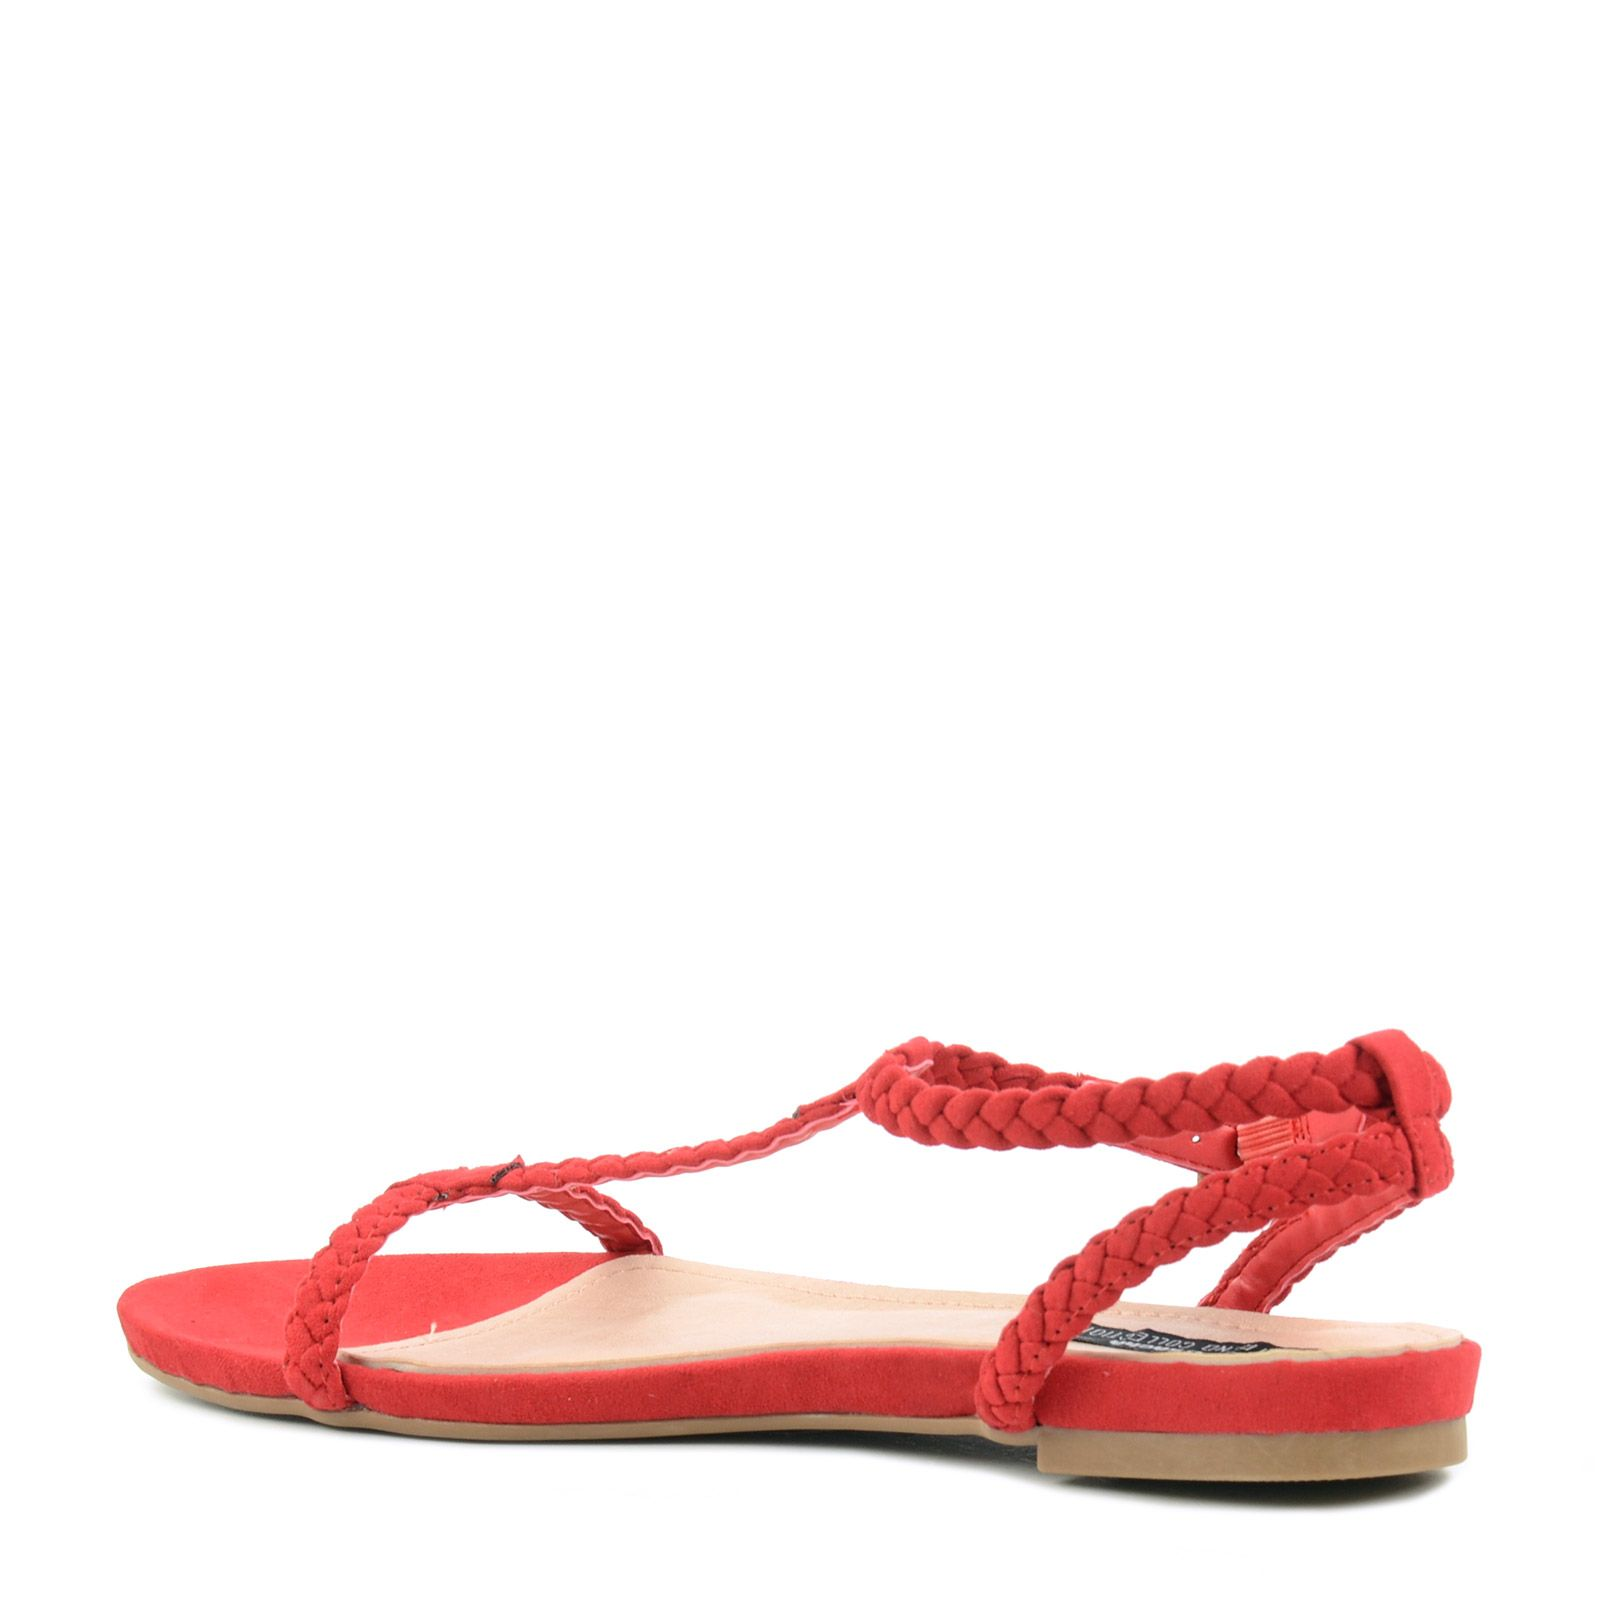 rote sandalen im minimal look damenschuhe